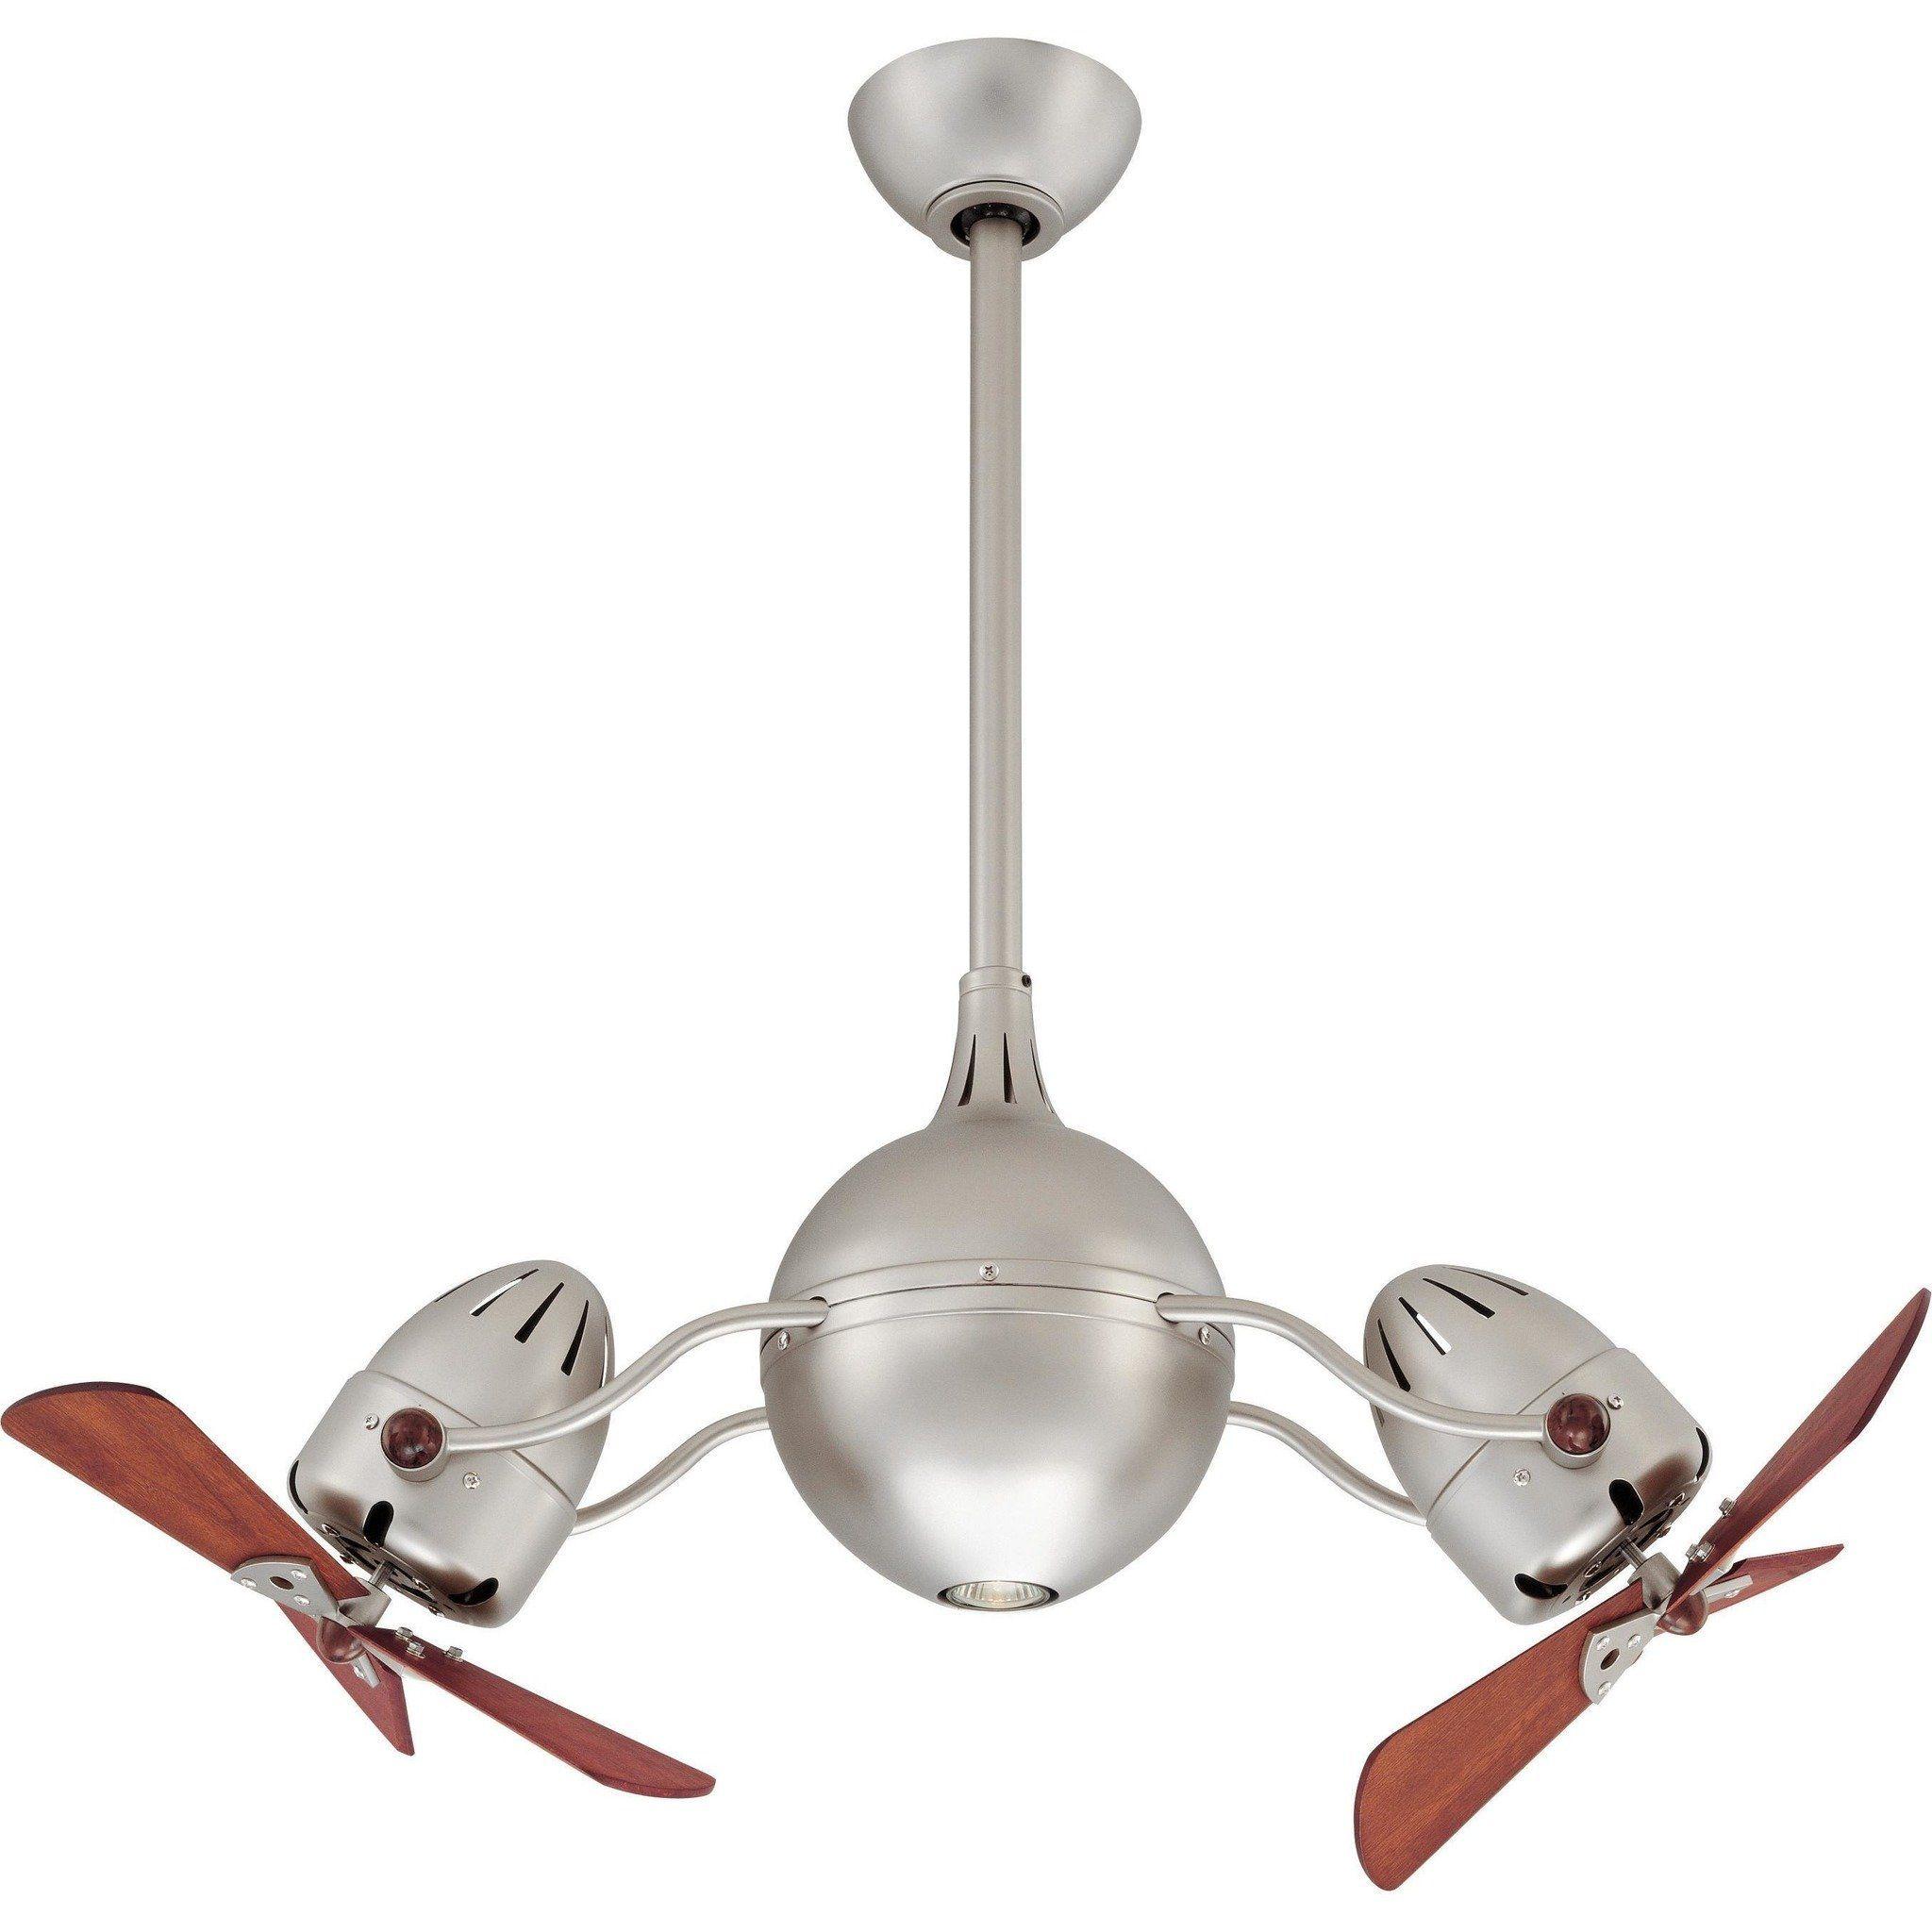 Acqua Dual Ceiling Fan